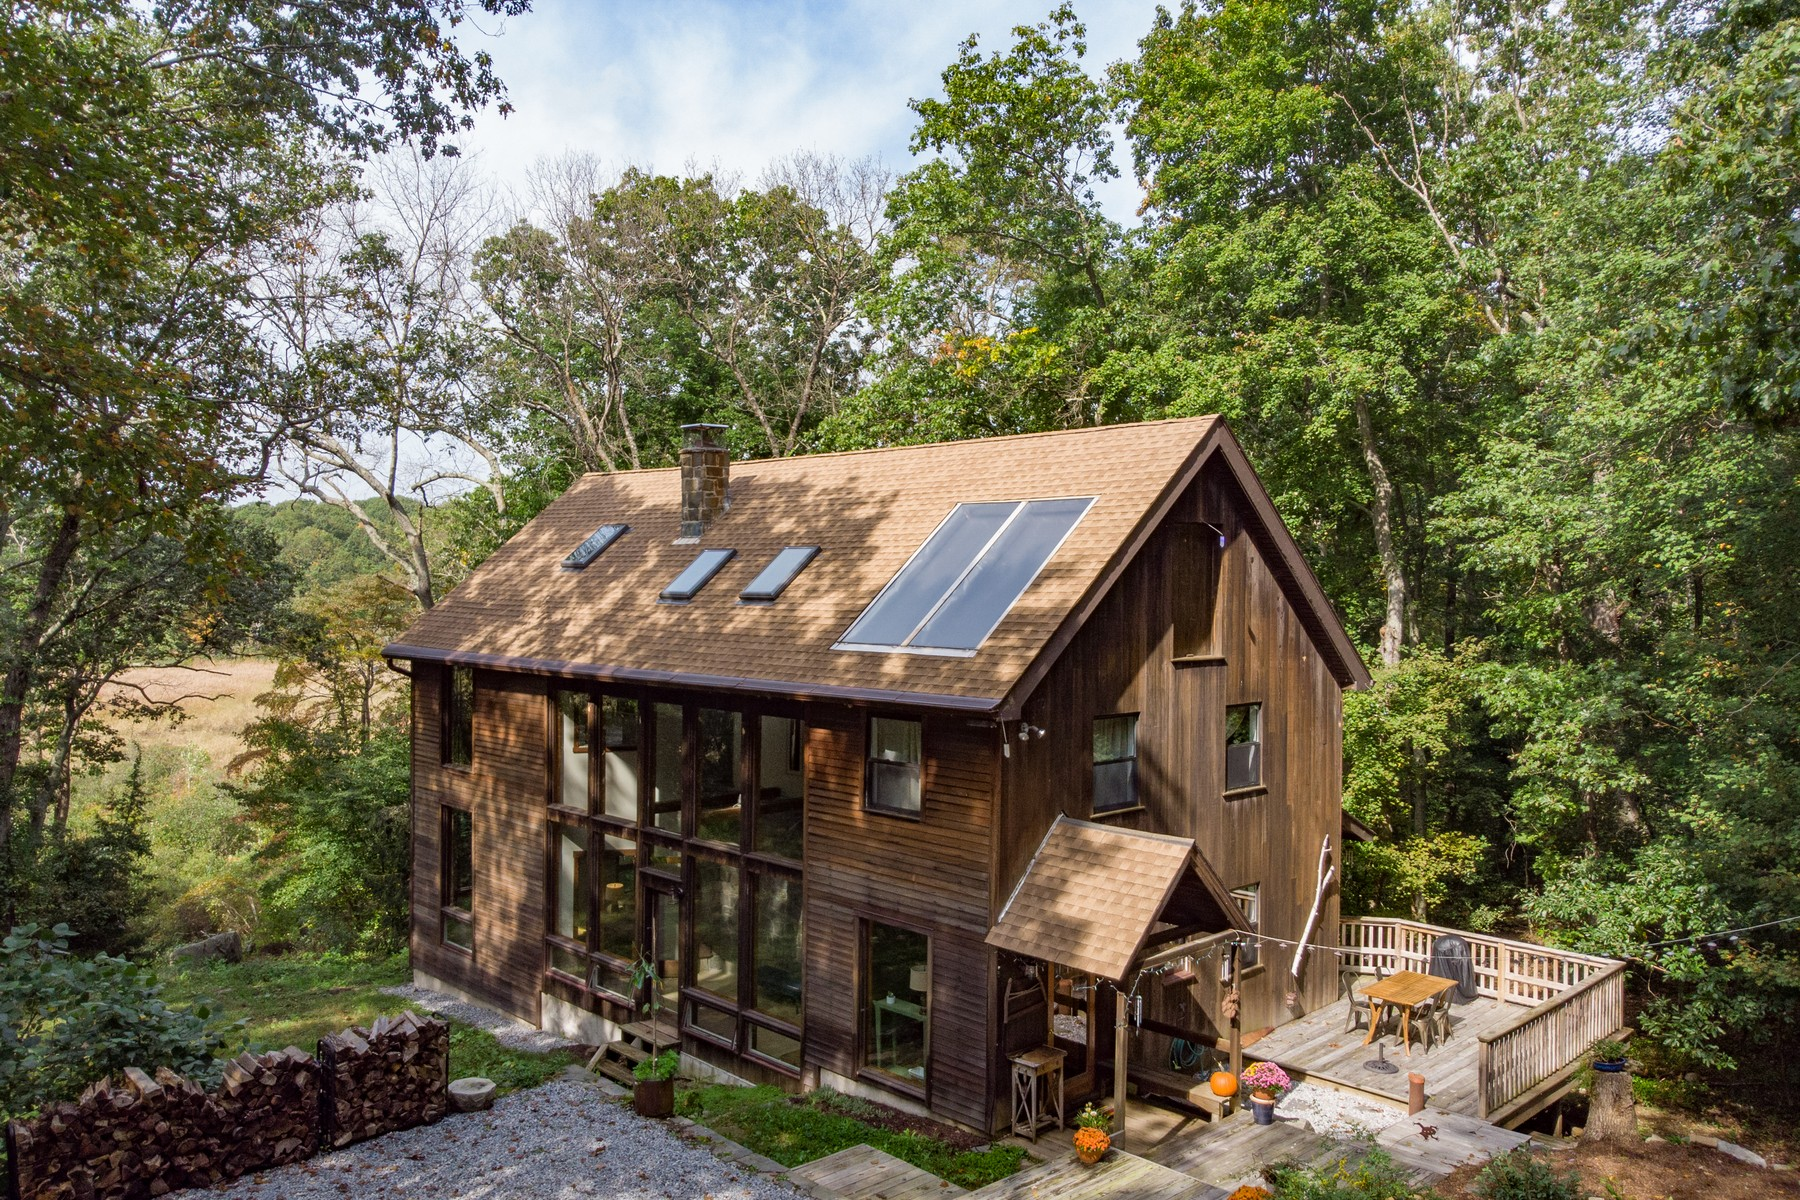 Eensgezinswoning voor Verkoop op Secluded ECO Contemporary Includes a Spacious Barn 93 Rattling Valley Rd, Deep River, Connecticut 06417 Verenigde Staten